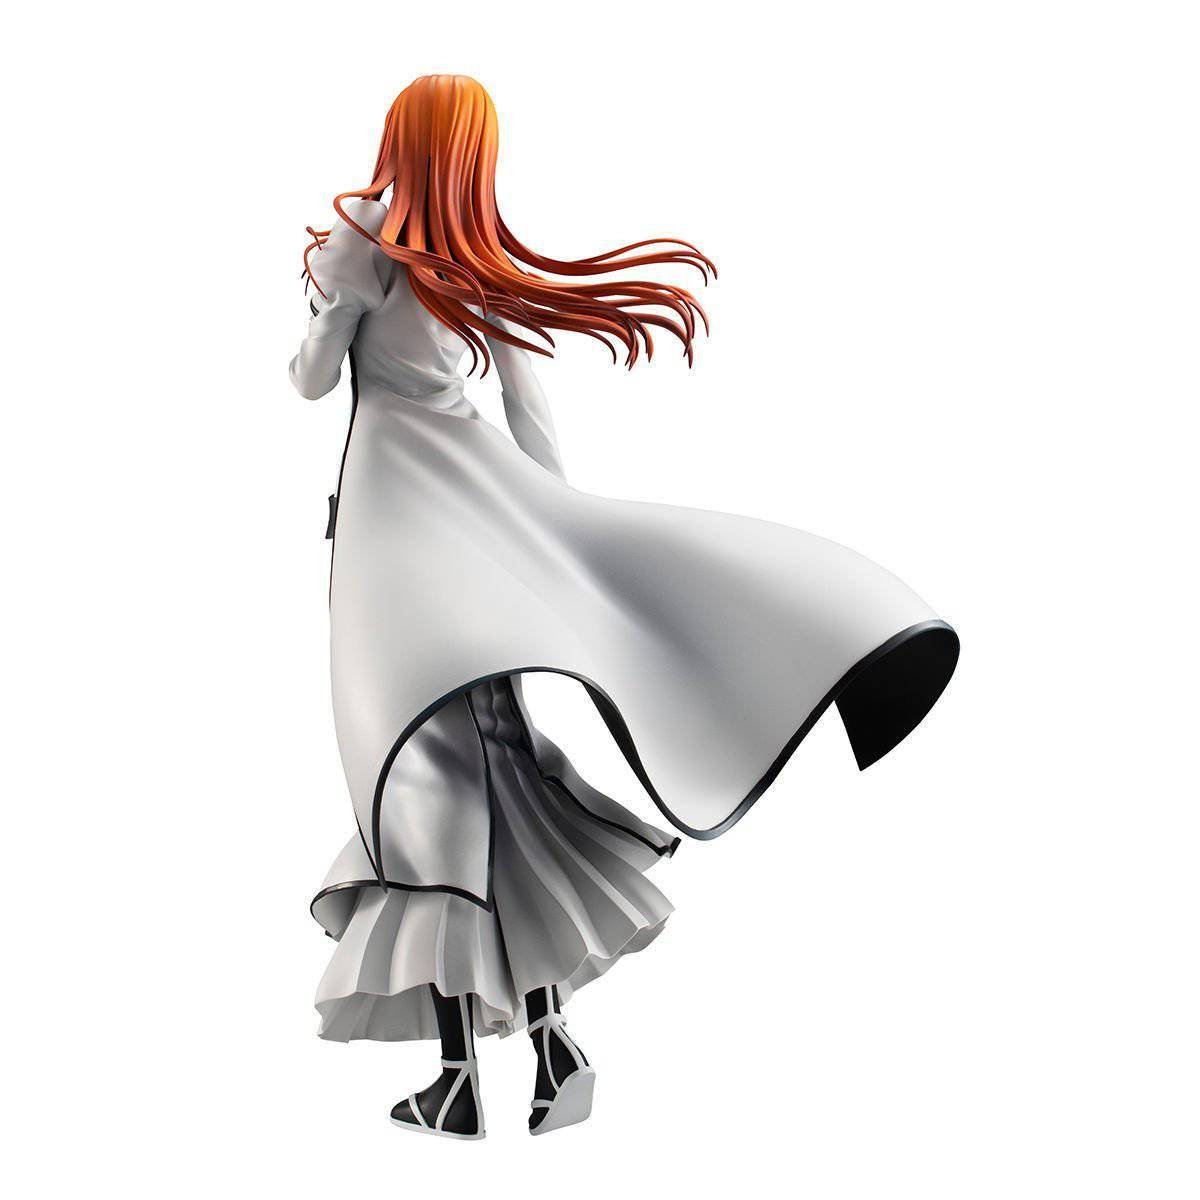 Orihime_3 - Figura semanal - (5-11-7-2021) - Hanami Dango